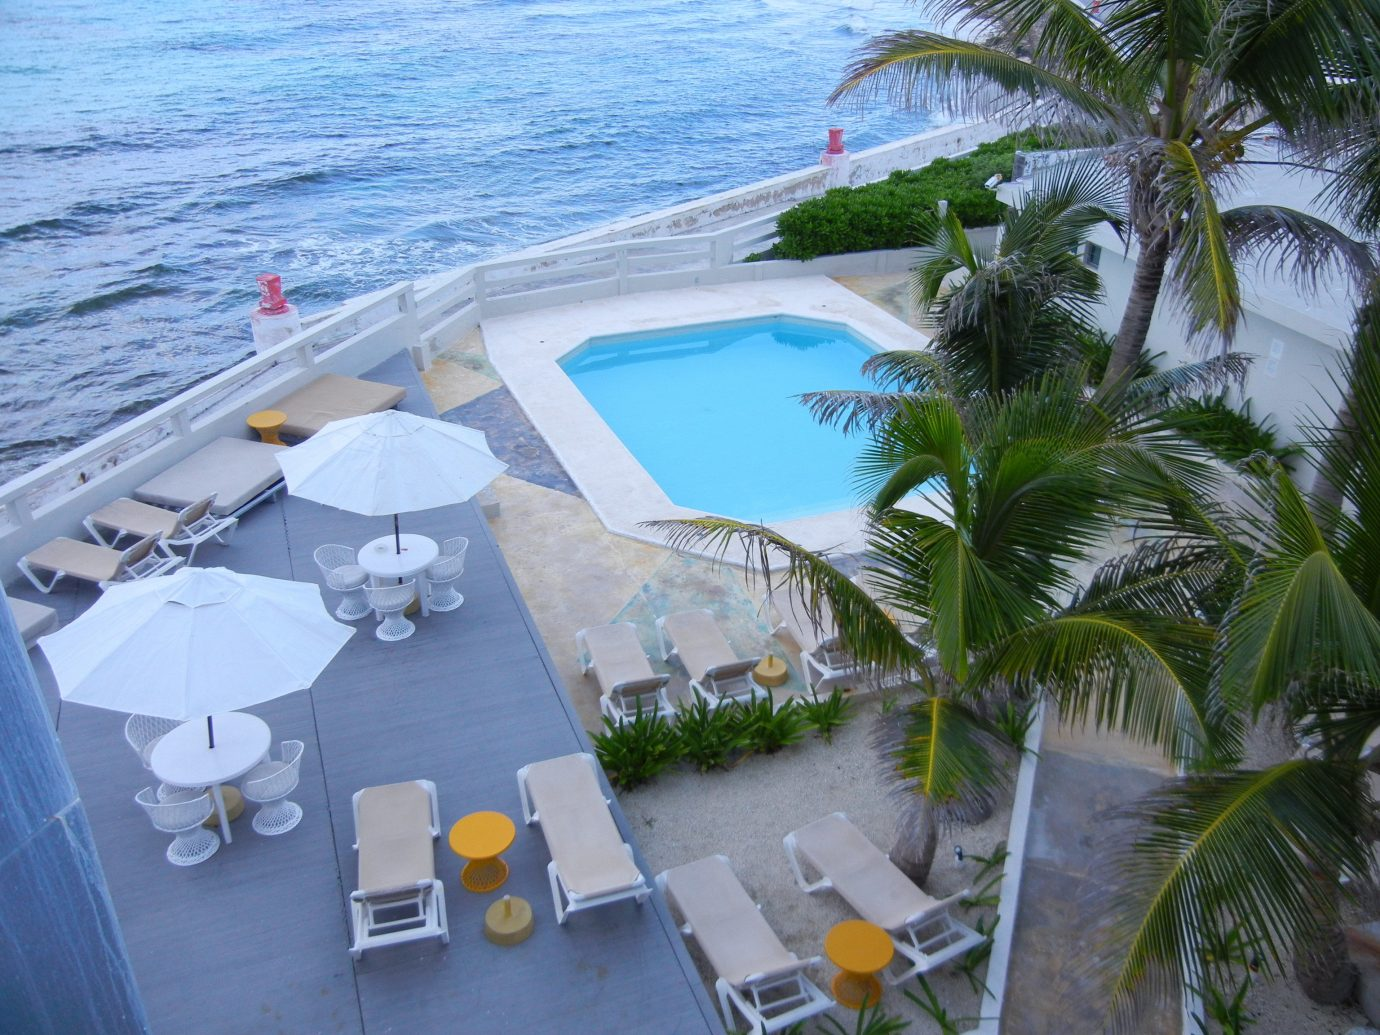 Budget outdoor caribbean Resort vacation marina vehicle swimming pool dock Sea tree plant shore